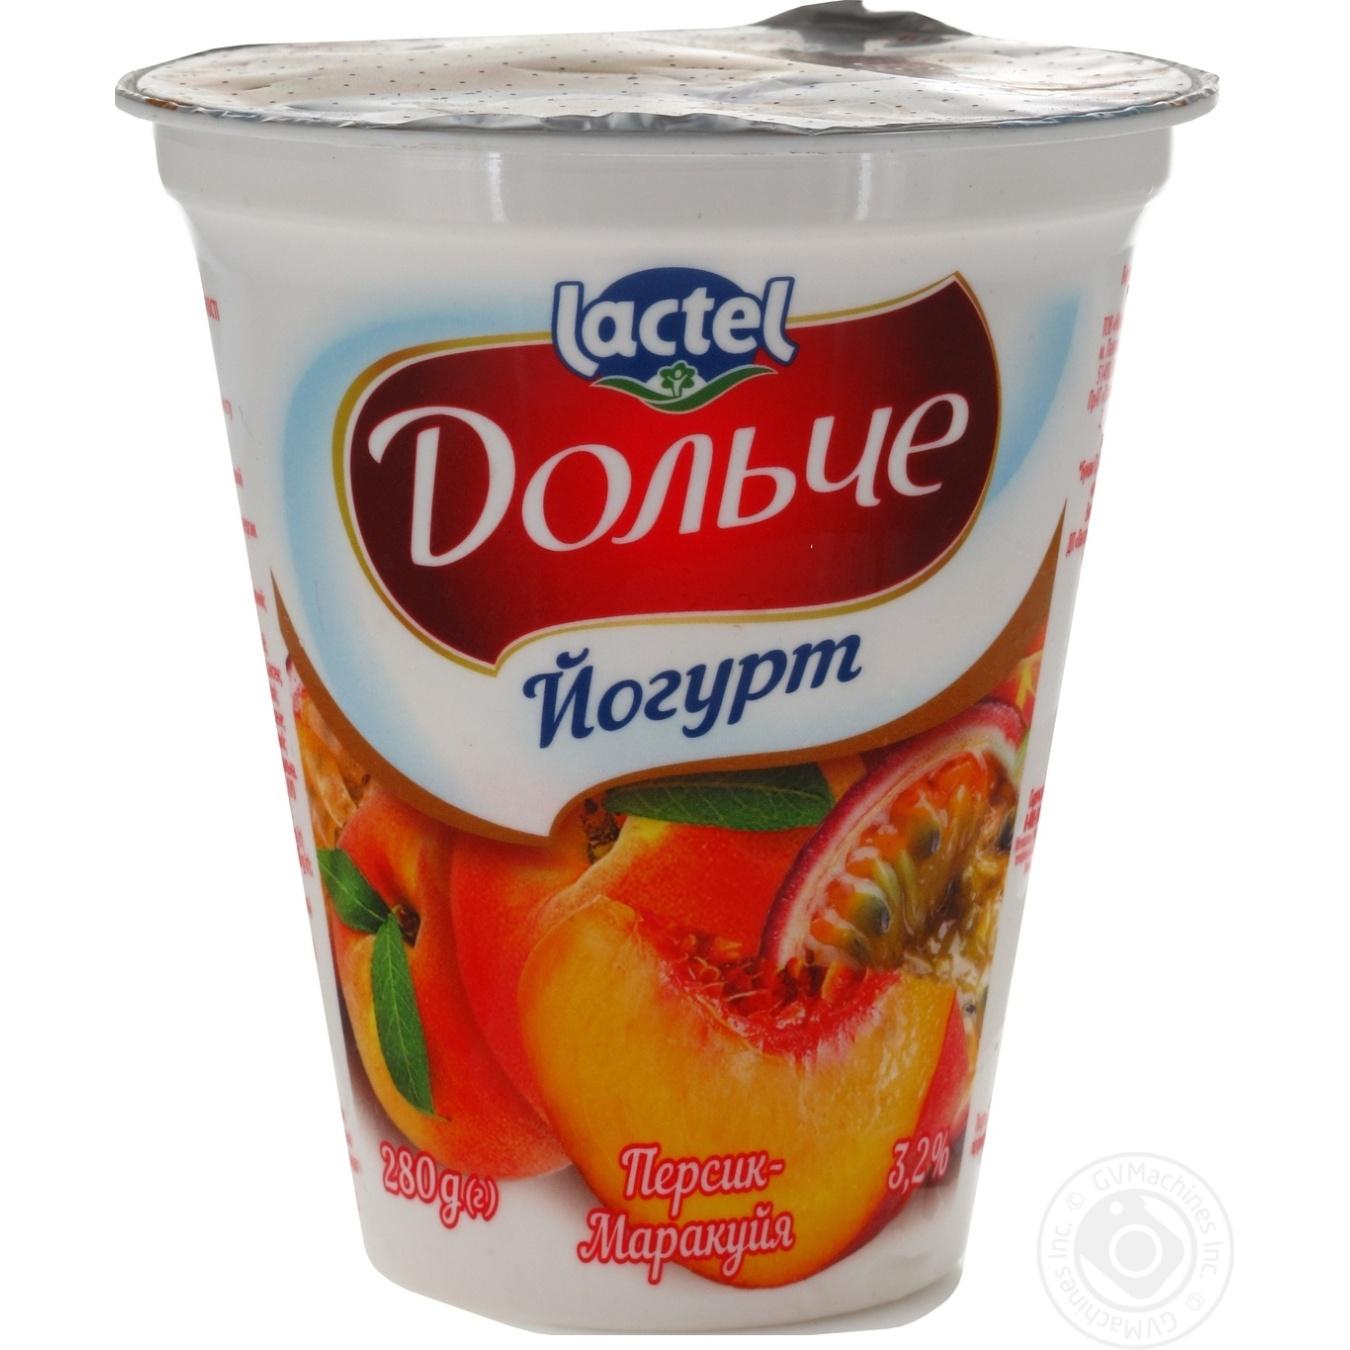 DOLCE ЙОГУРТ 3,2% 280Г ПЕРСИК-МАРАКУЯ